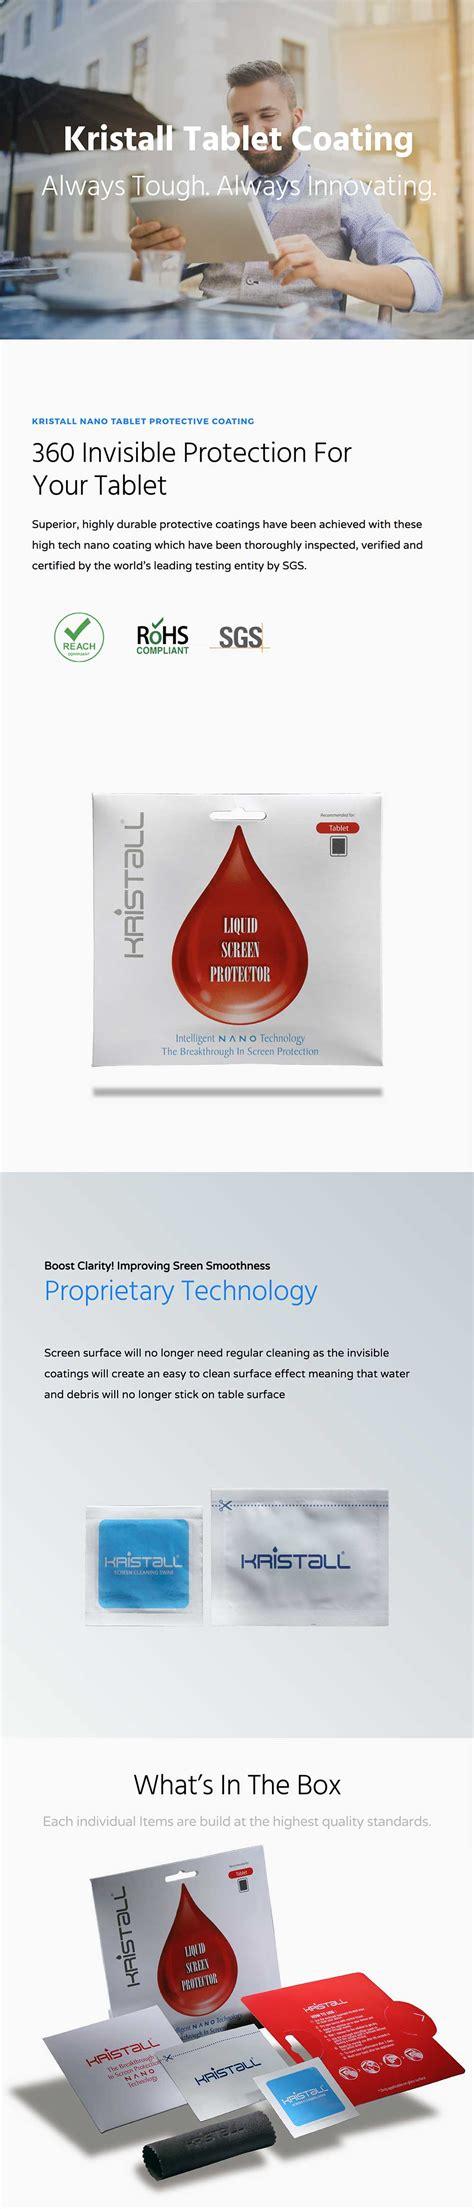 9h Nano Liquid Screen Guard Protector Samsung Galaxy Tab S2 9 7 Lte kristall liquid screen protector nano coating for tablets